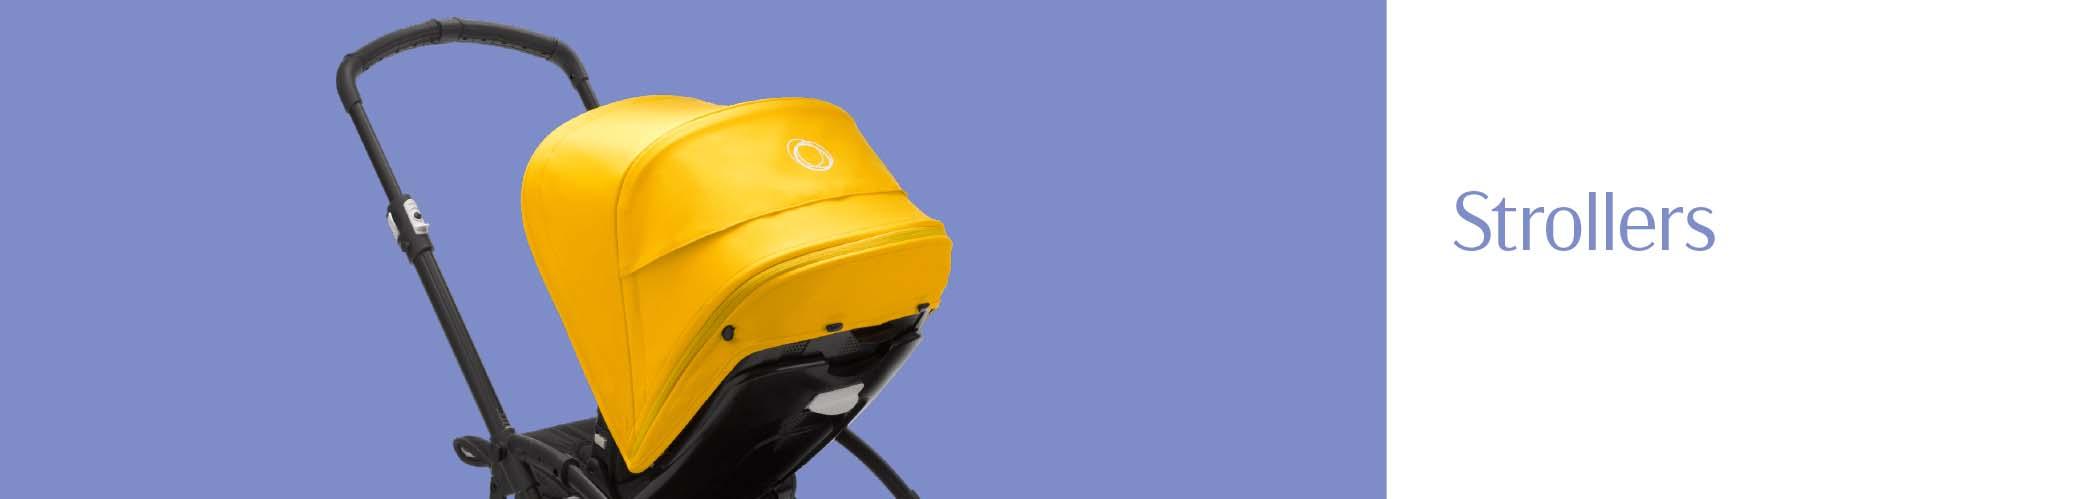 -06-strollers-internalbanner-may21.jpg